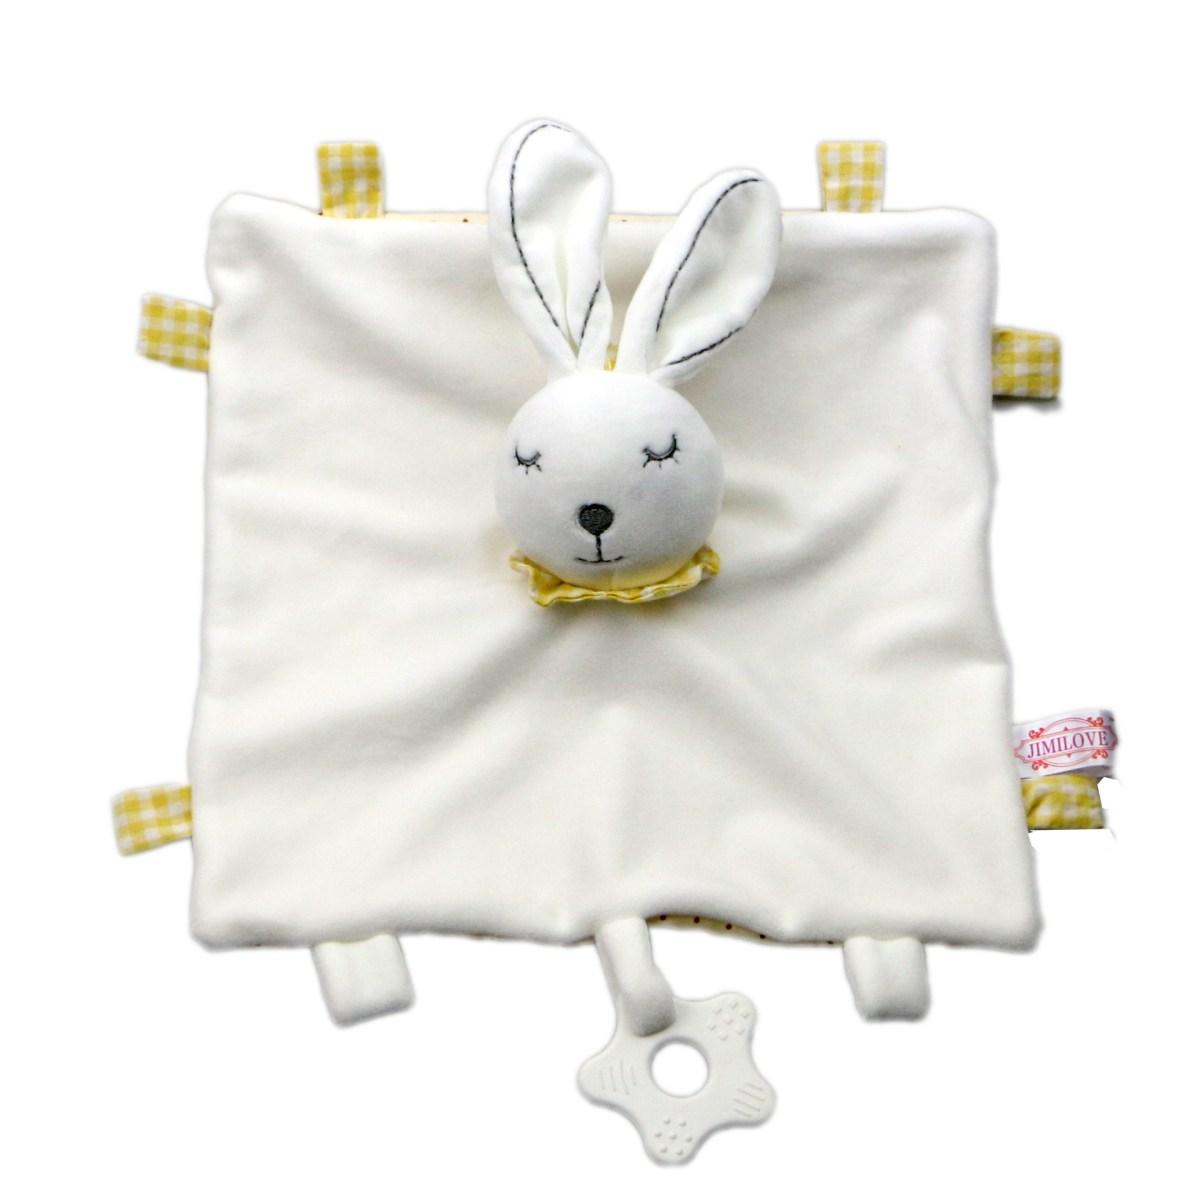 Baby Multifunctional Teether Comforting Towel White Rabbit